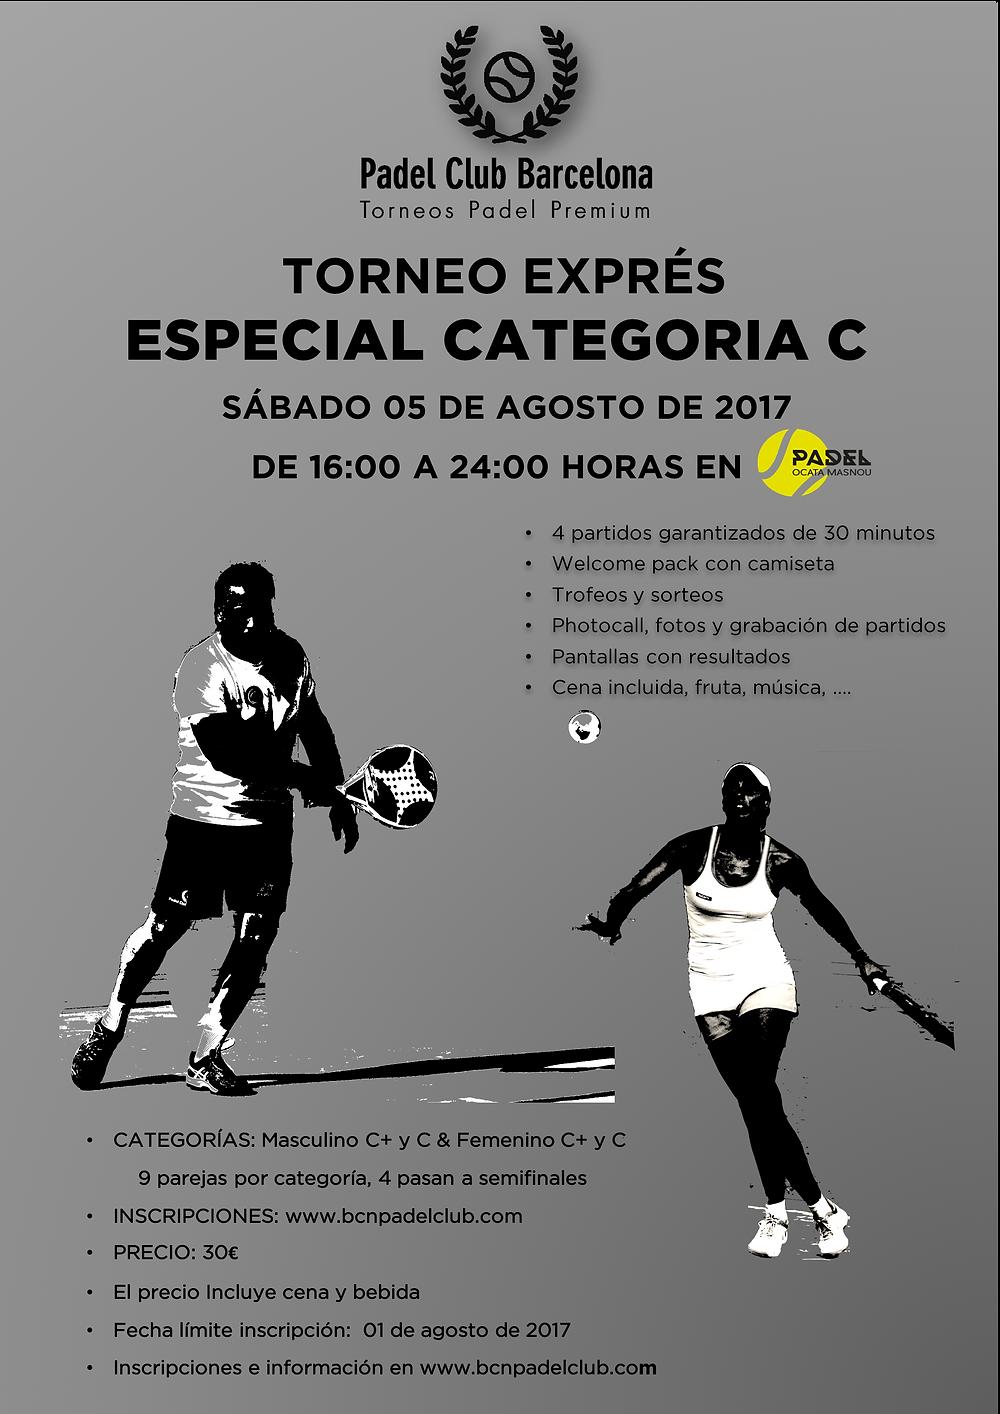 05 DE AGOSTO - PADEL CLUB OCATA-MASNOU